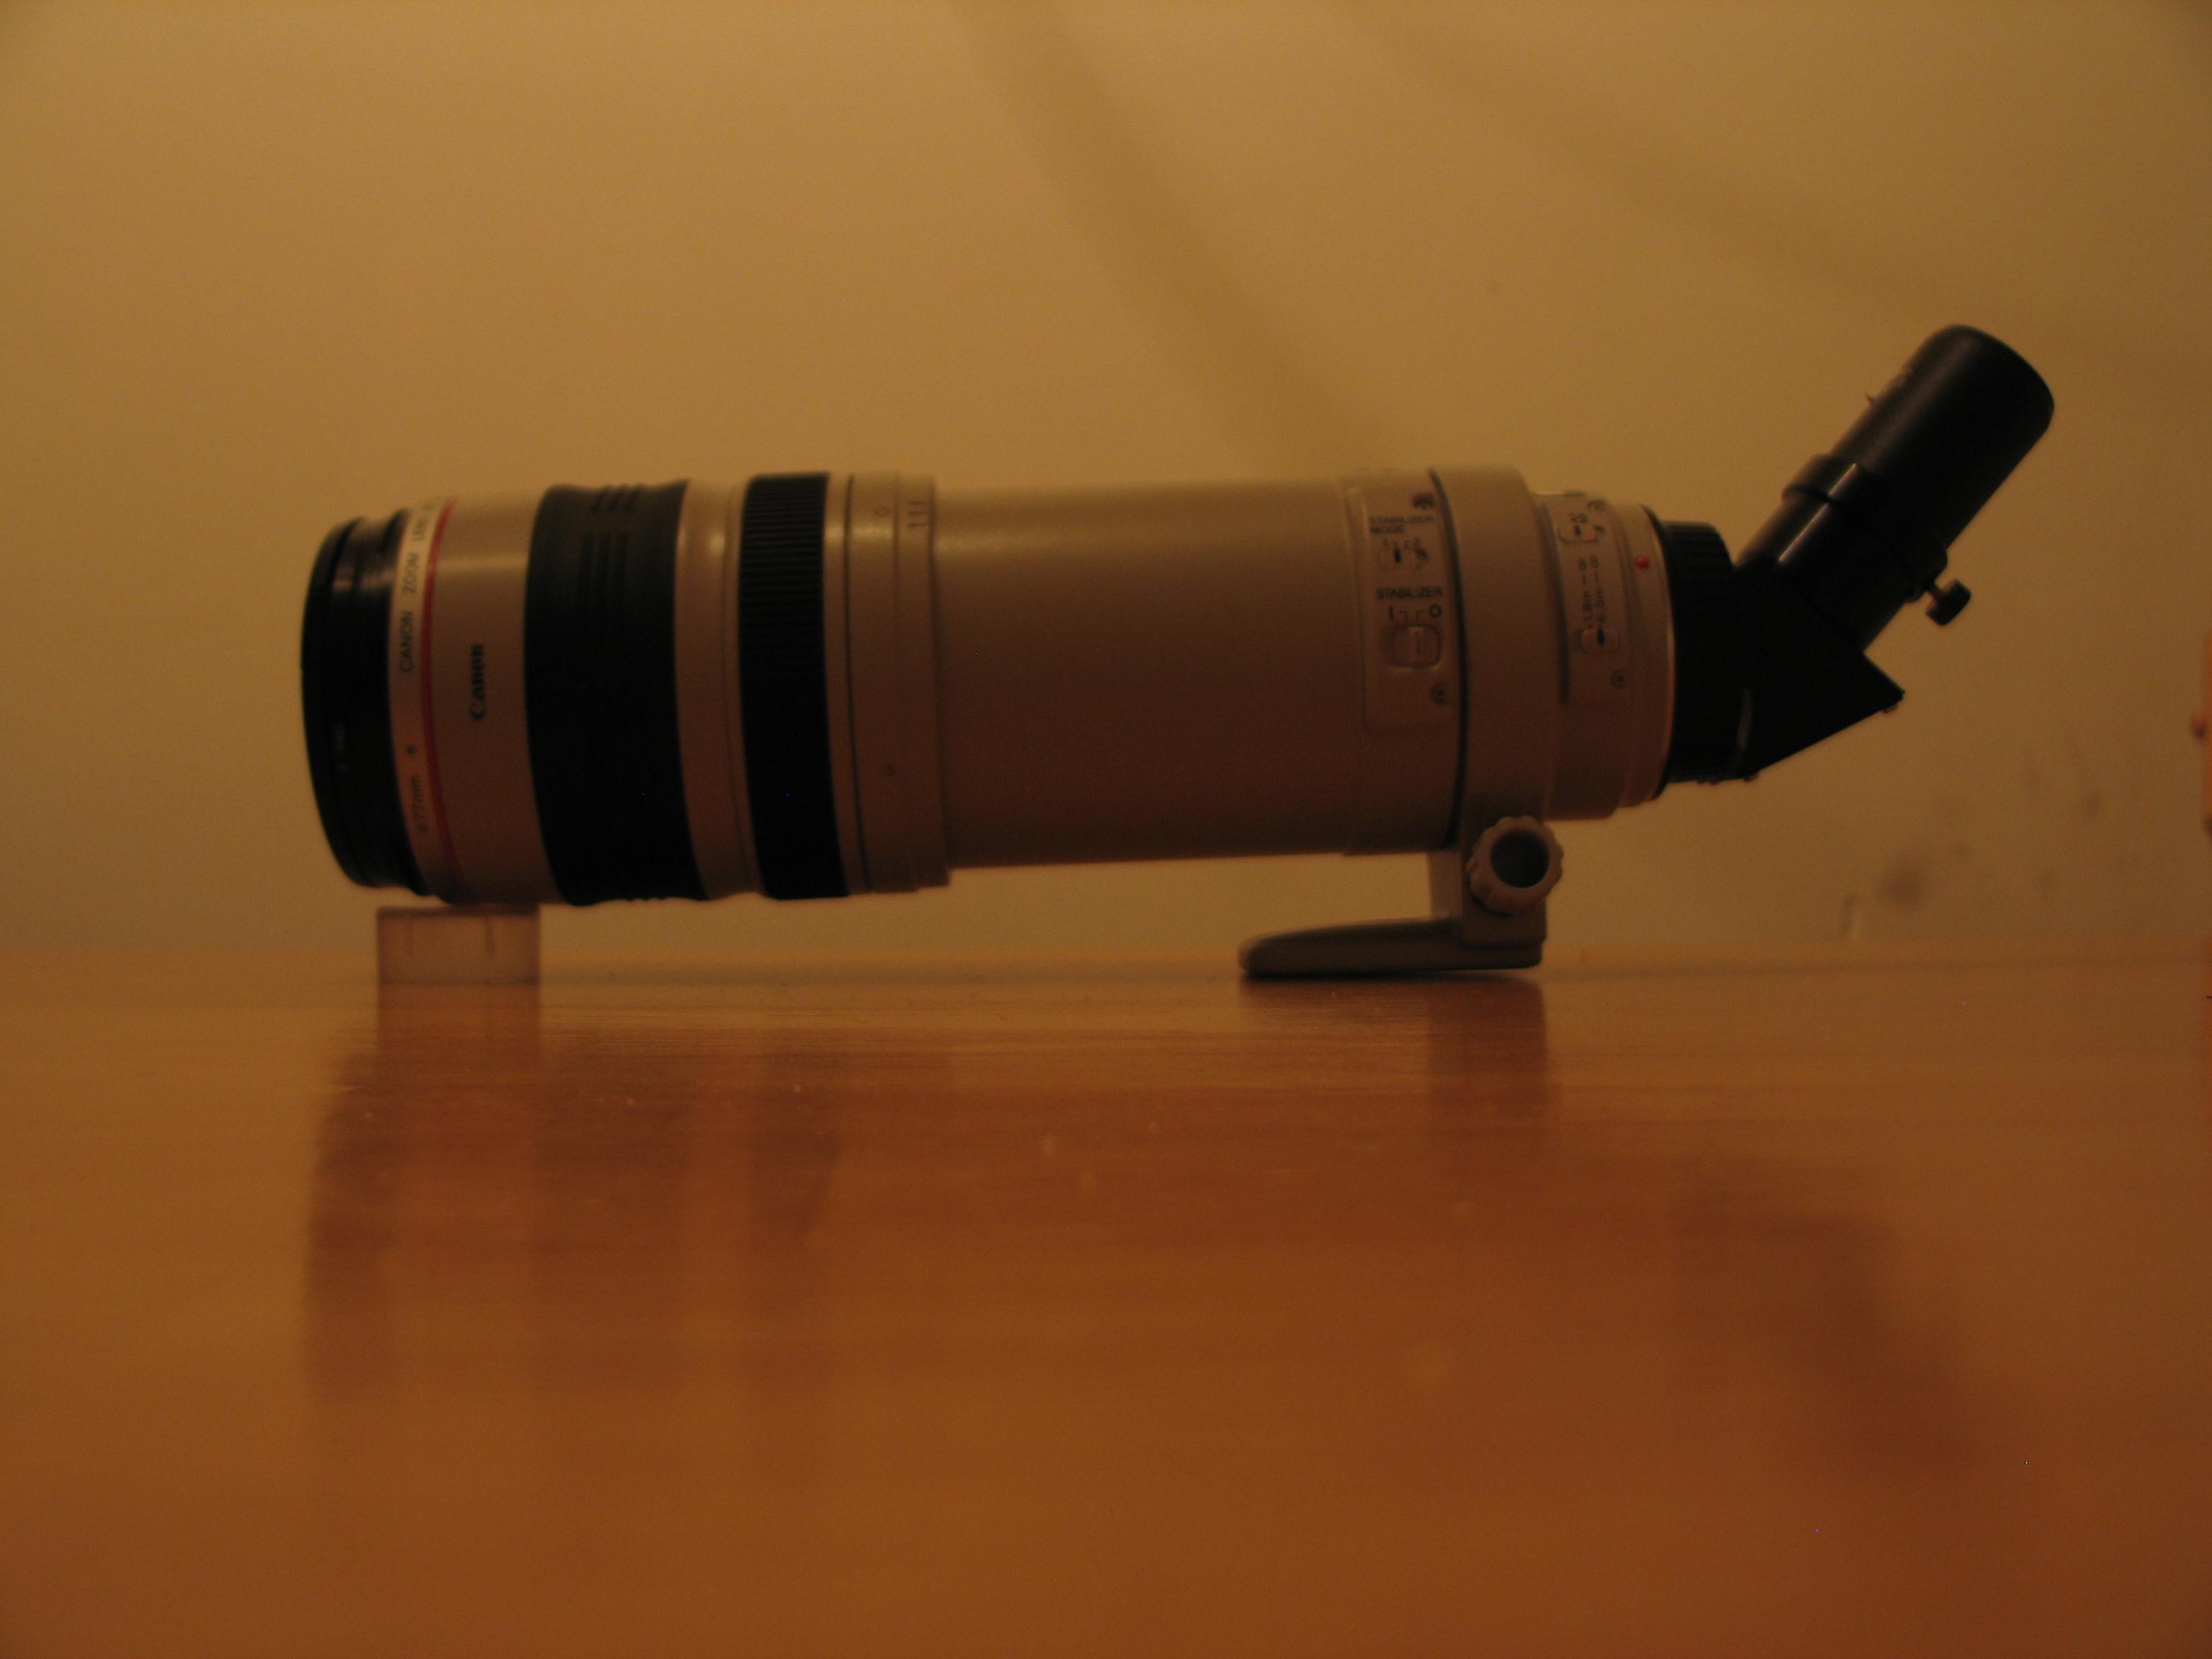 Turn a telephoto lens into a spotting scope or telescope